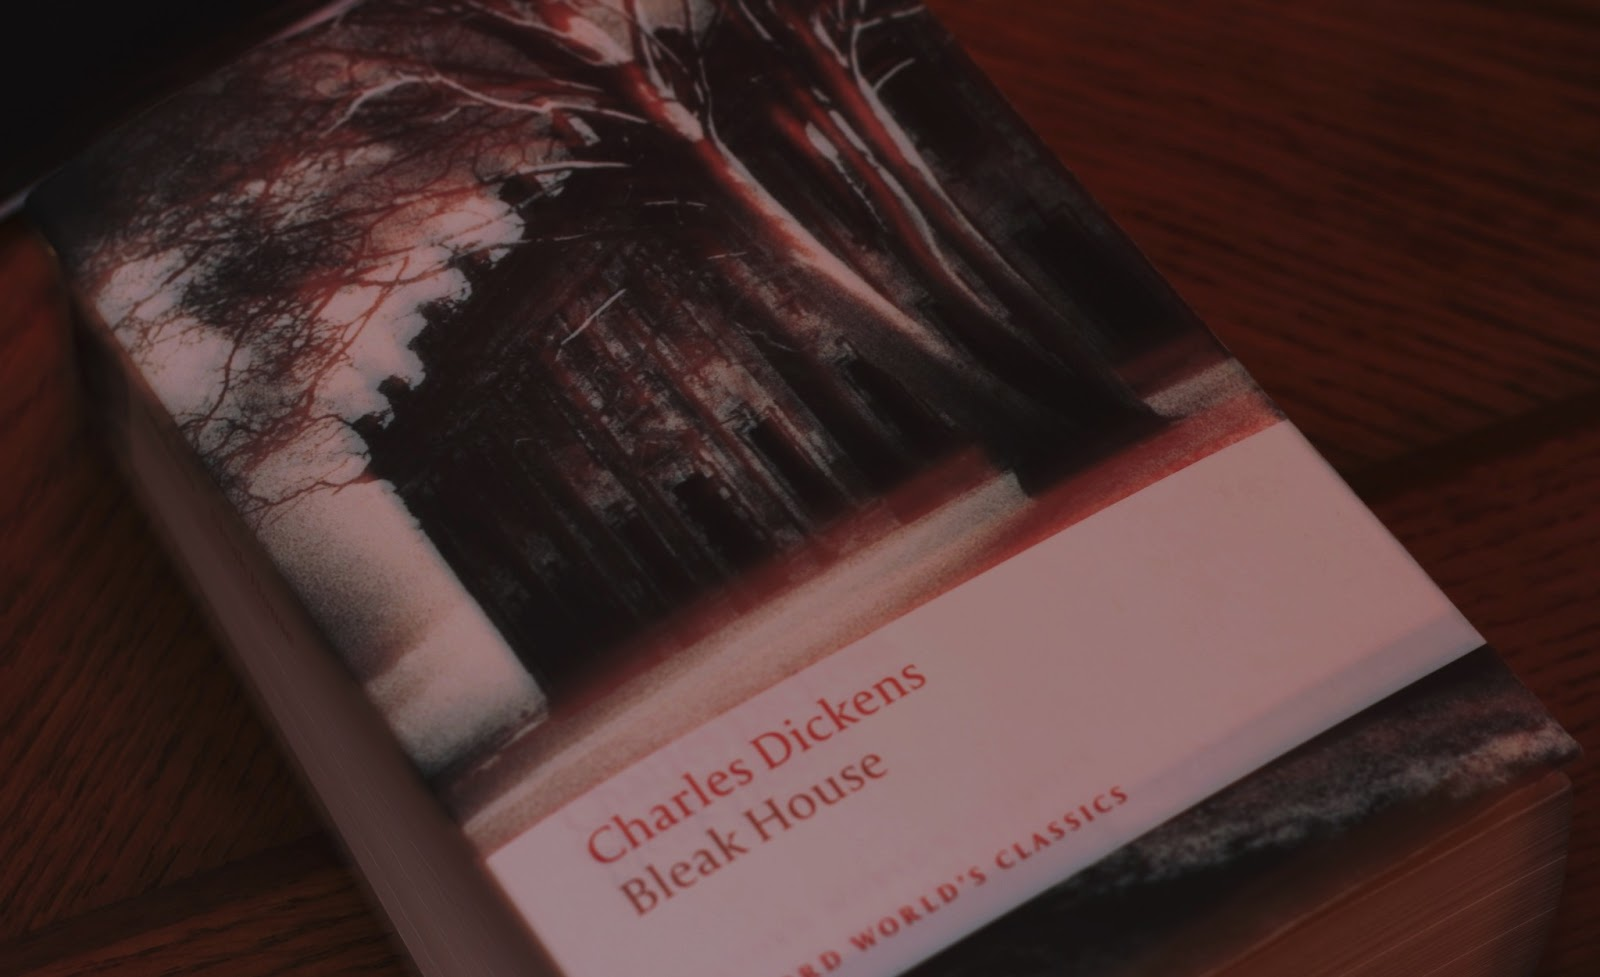 Charles dickens novels analysis of major